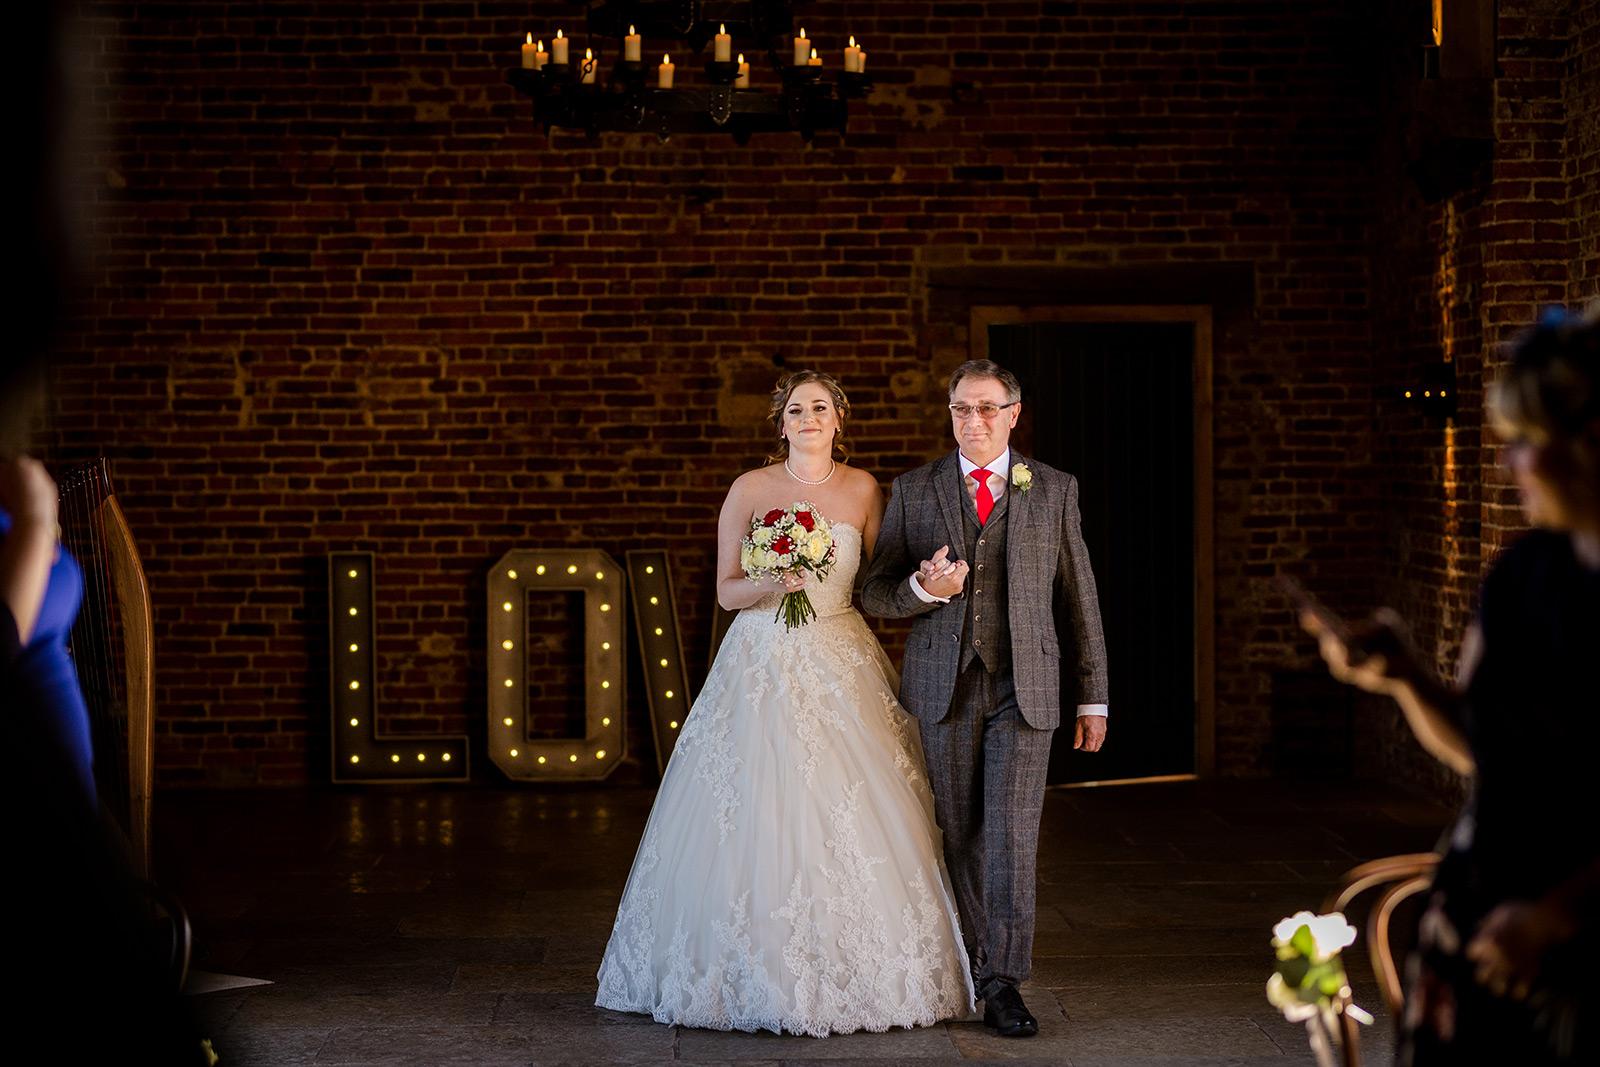 The bride arrives to her Hazel Gap Barn wedding